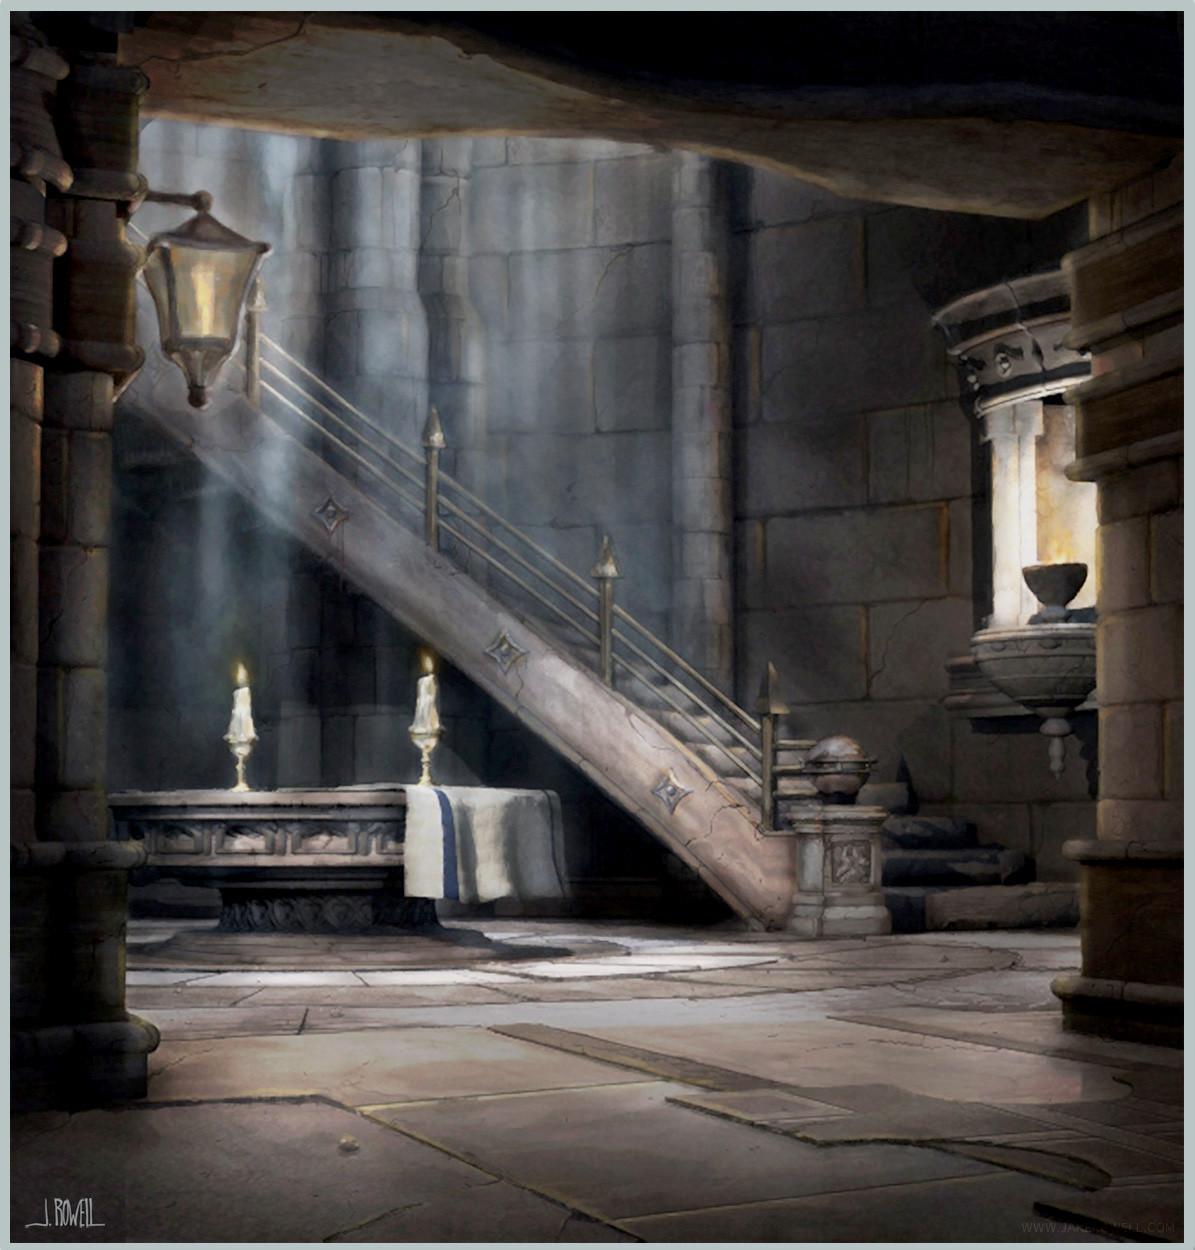 Alexandria-Castle-Stairs5-FFIX.JPG